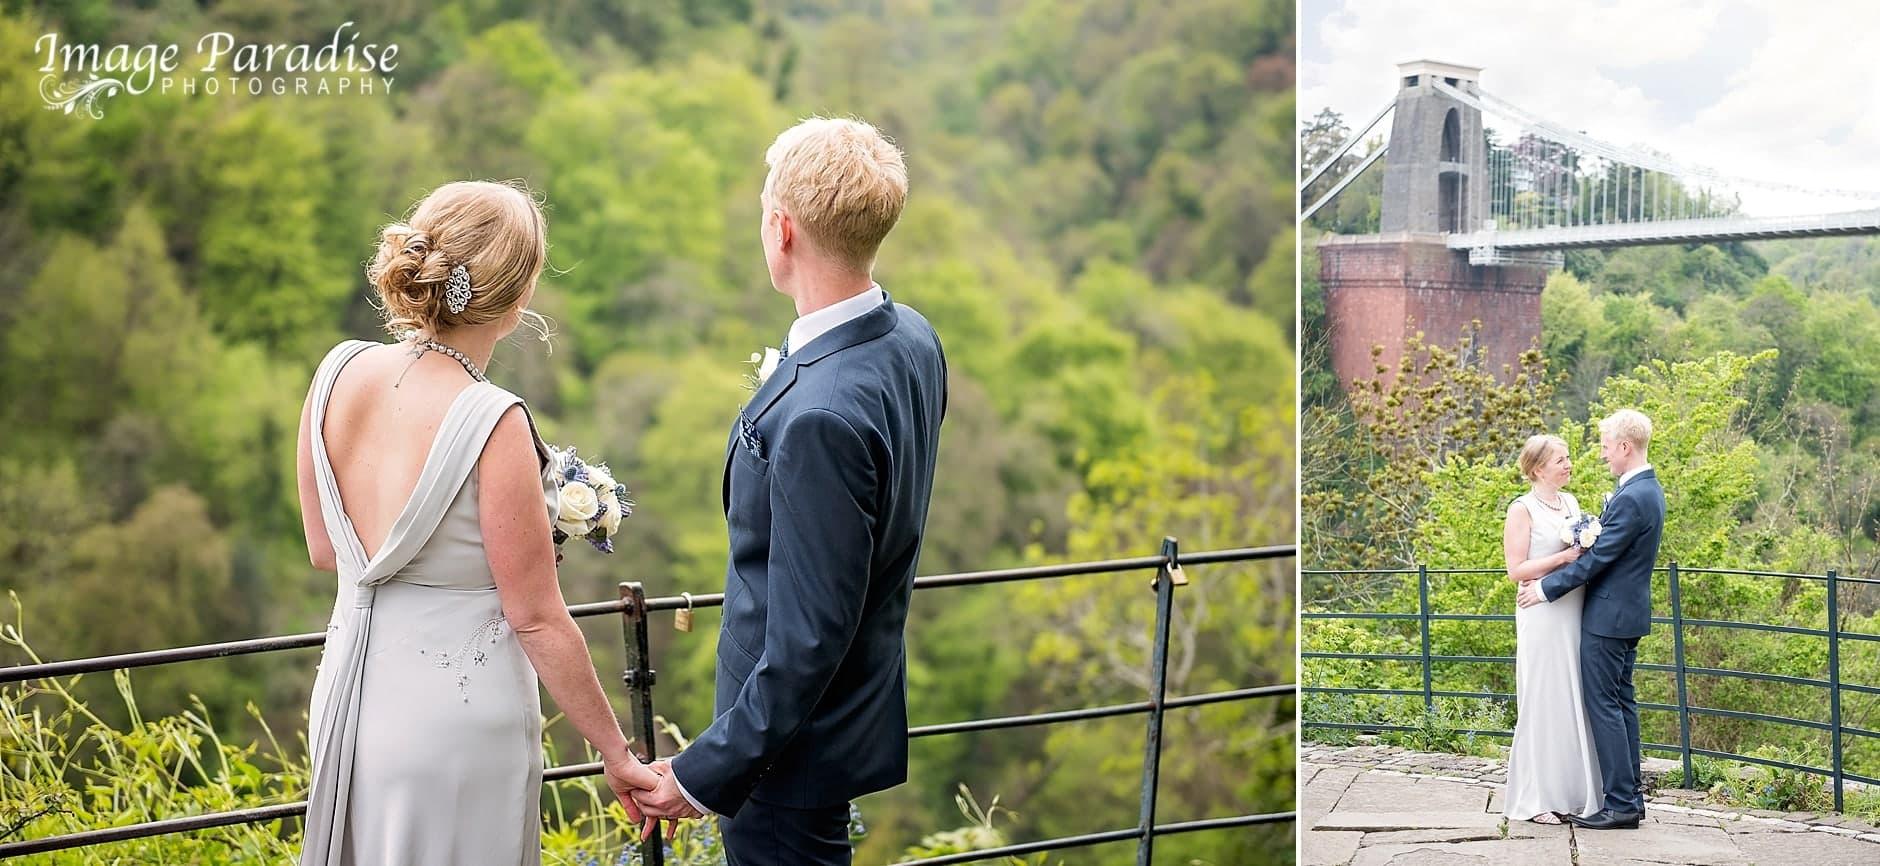 Avon Gorge hotel wedding by the Clifton suspension bridge